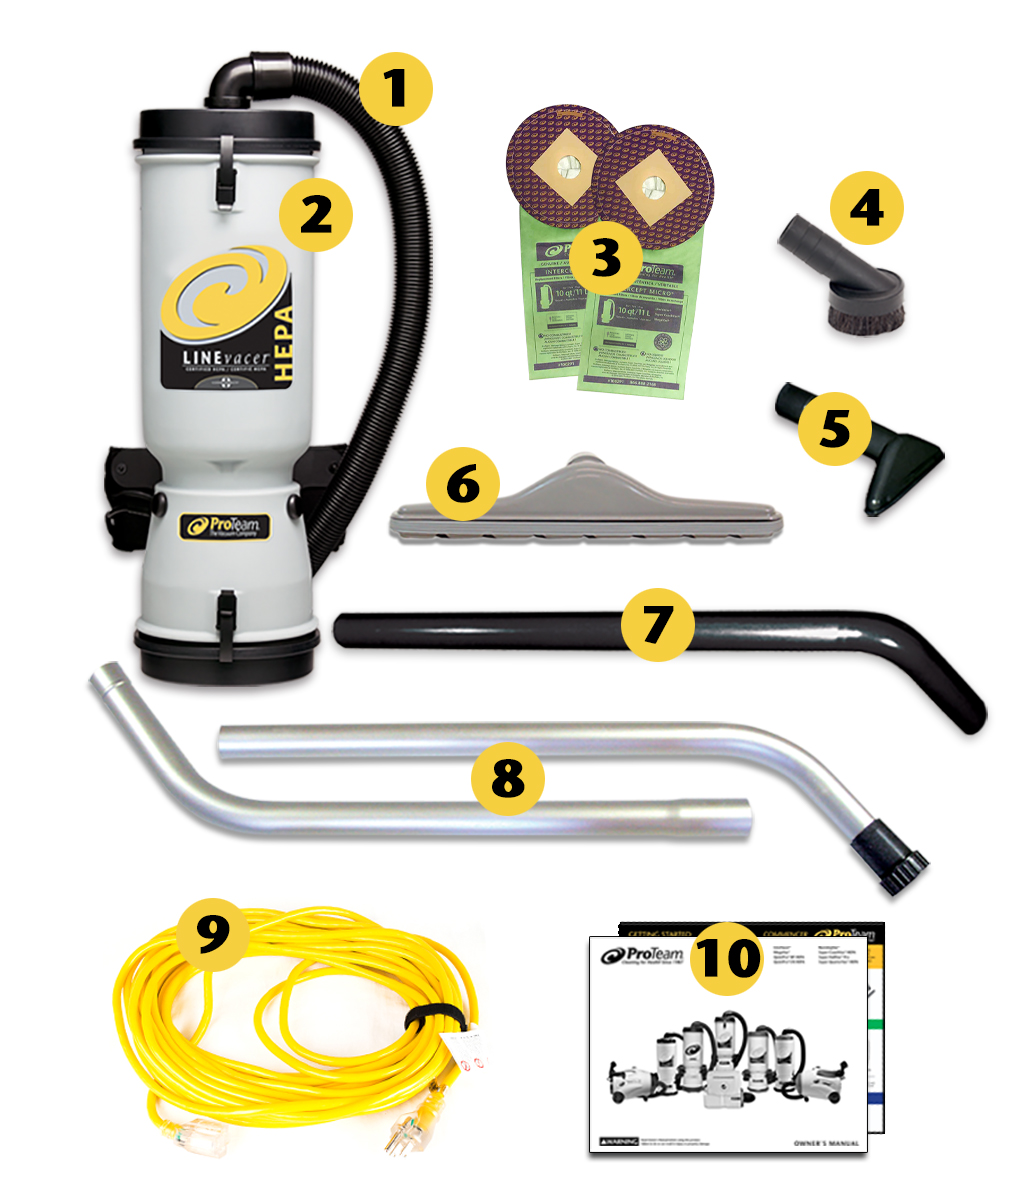 New 100687 LV-100 ProTeam Commercial Backpack Vacuum 10 Quart LineVacer ULPA